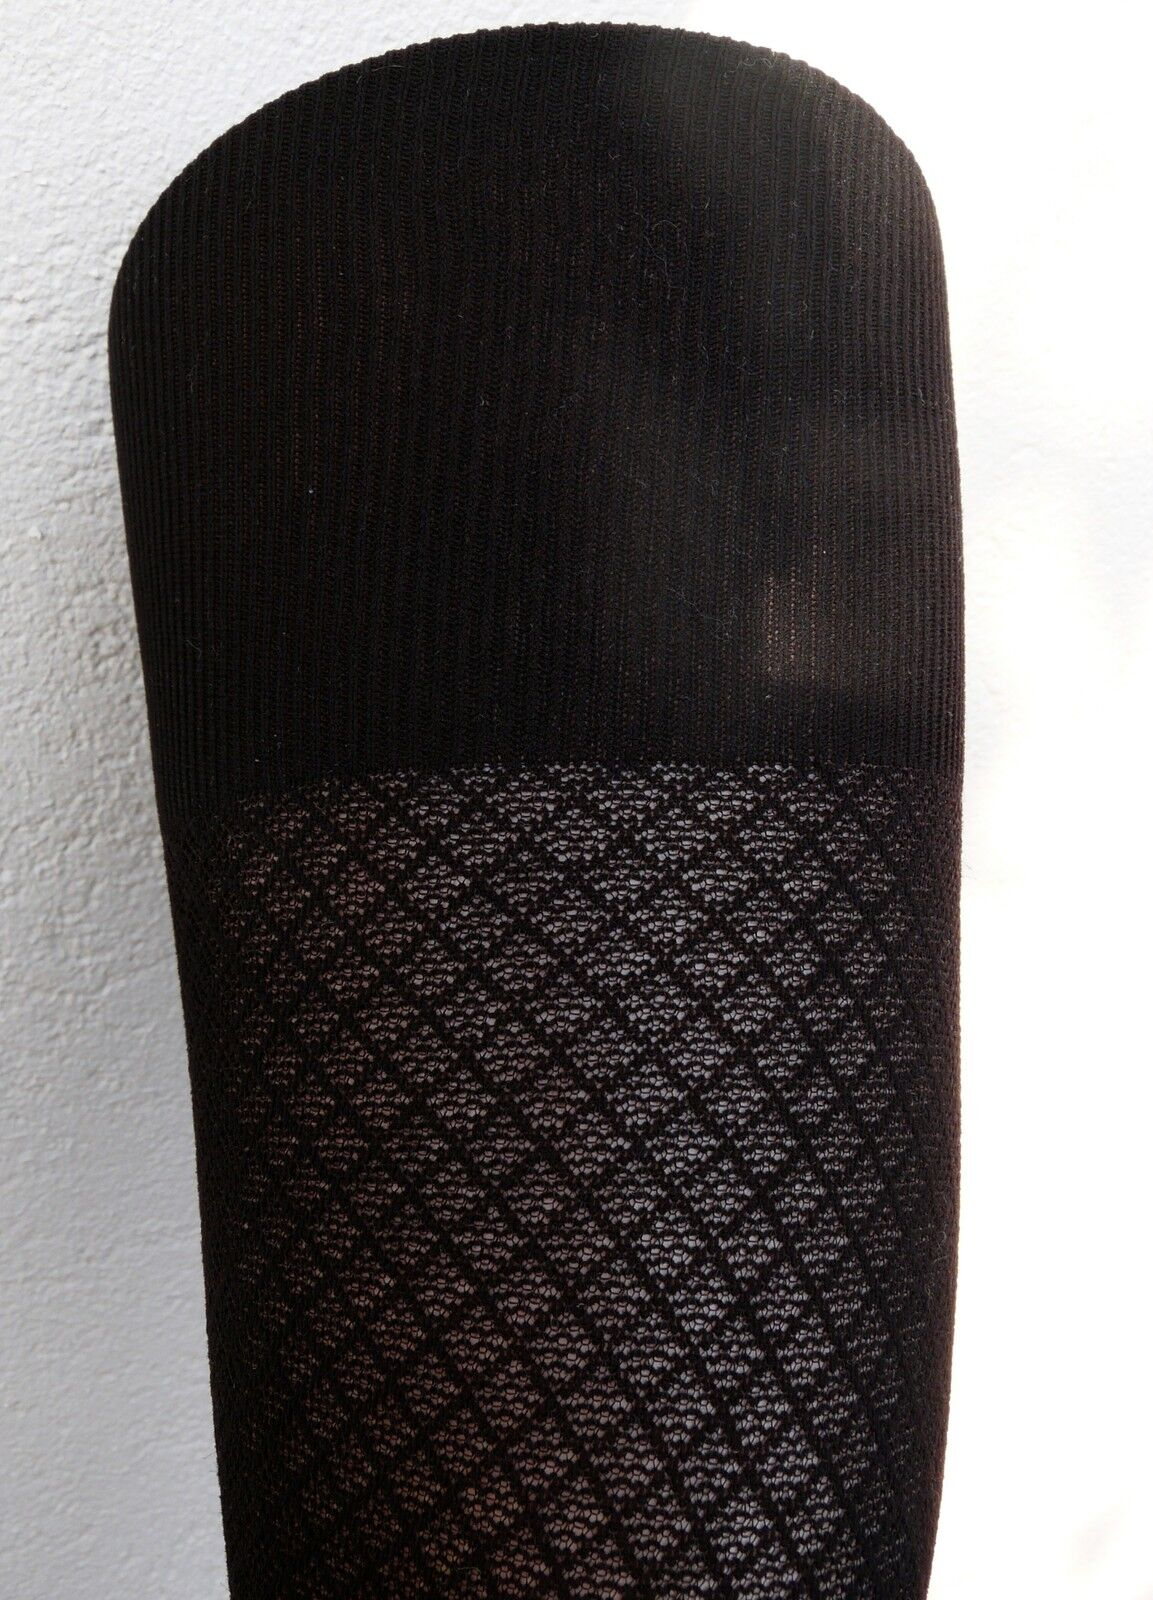 sexy bas porte jarretelle vintage ann e 60 dentelle. Black Bedroom Furniture Sets. Home Design Ideas